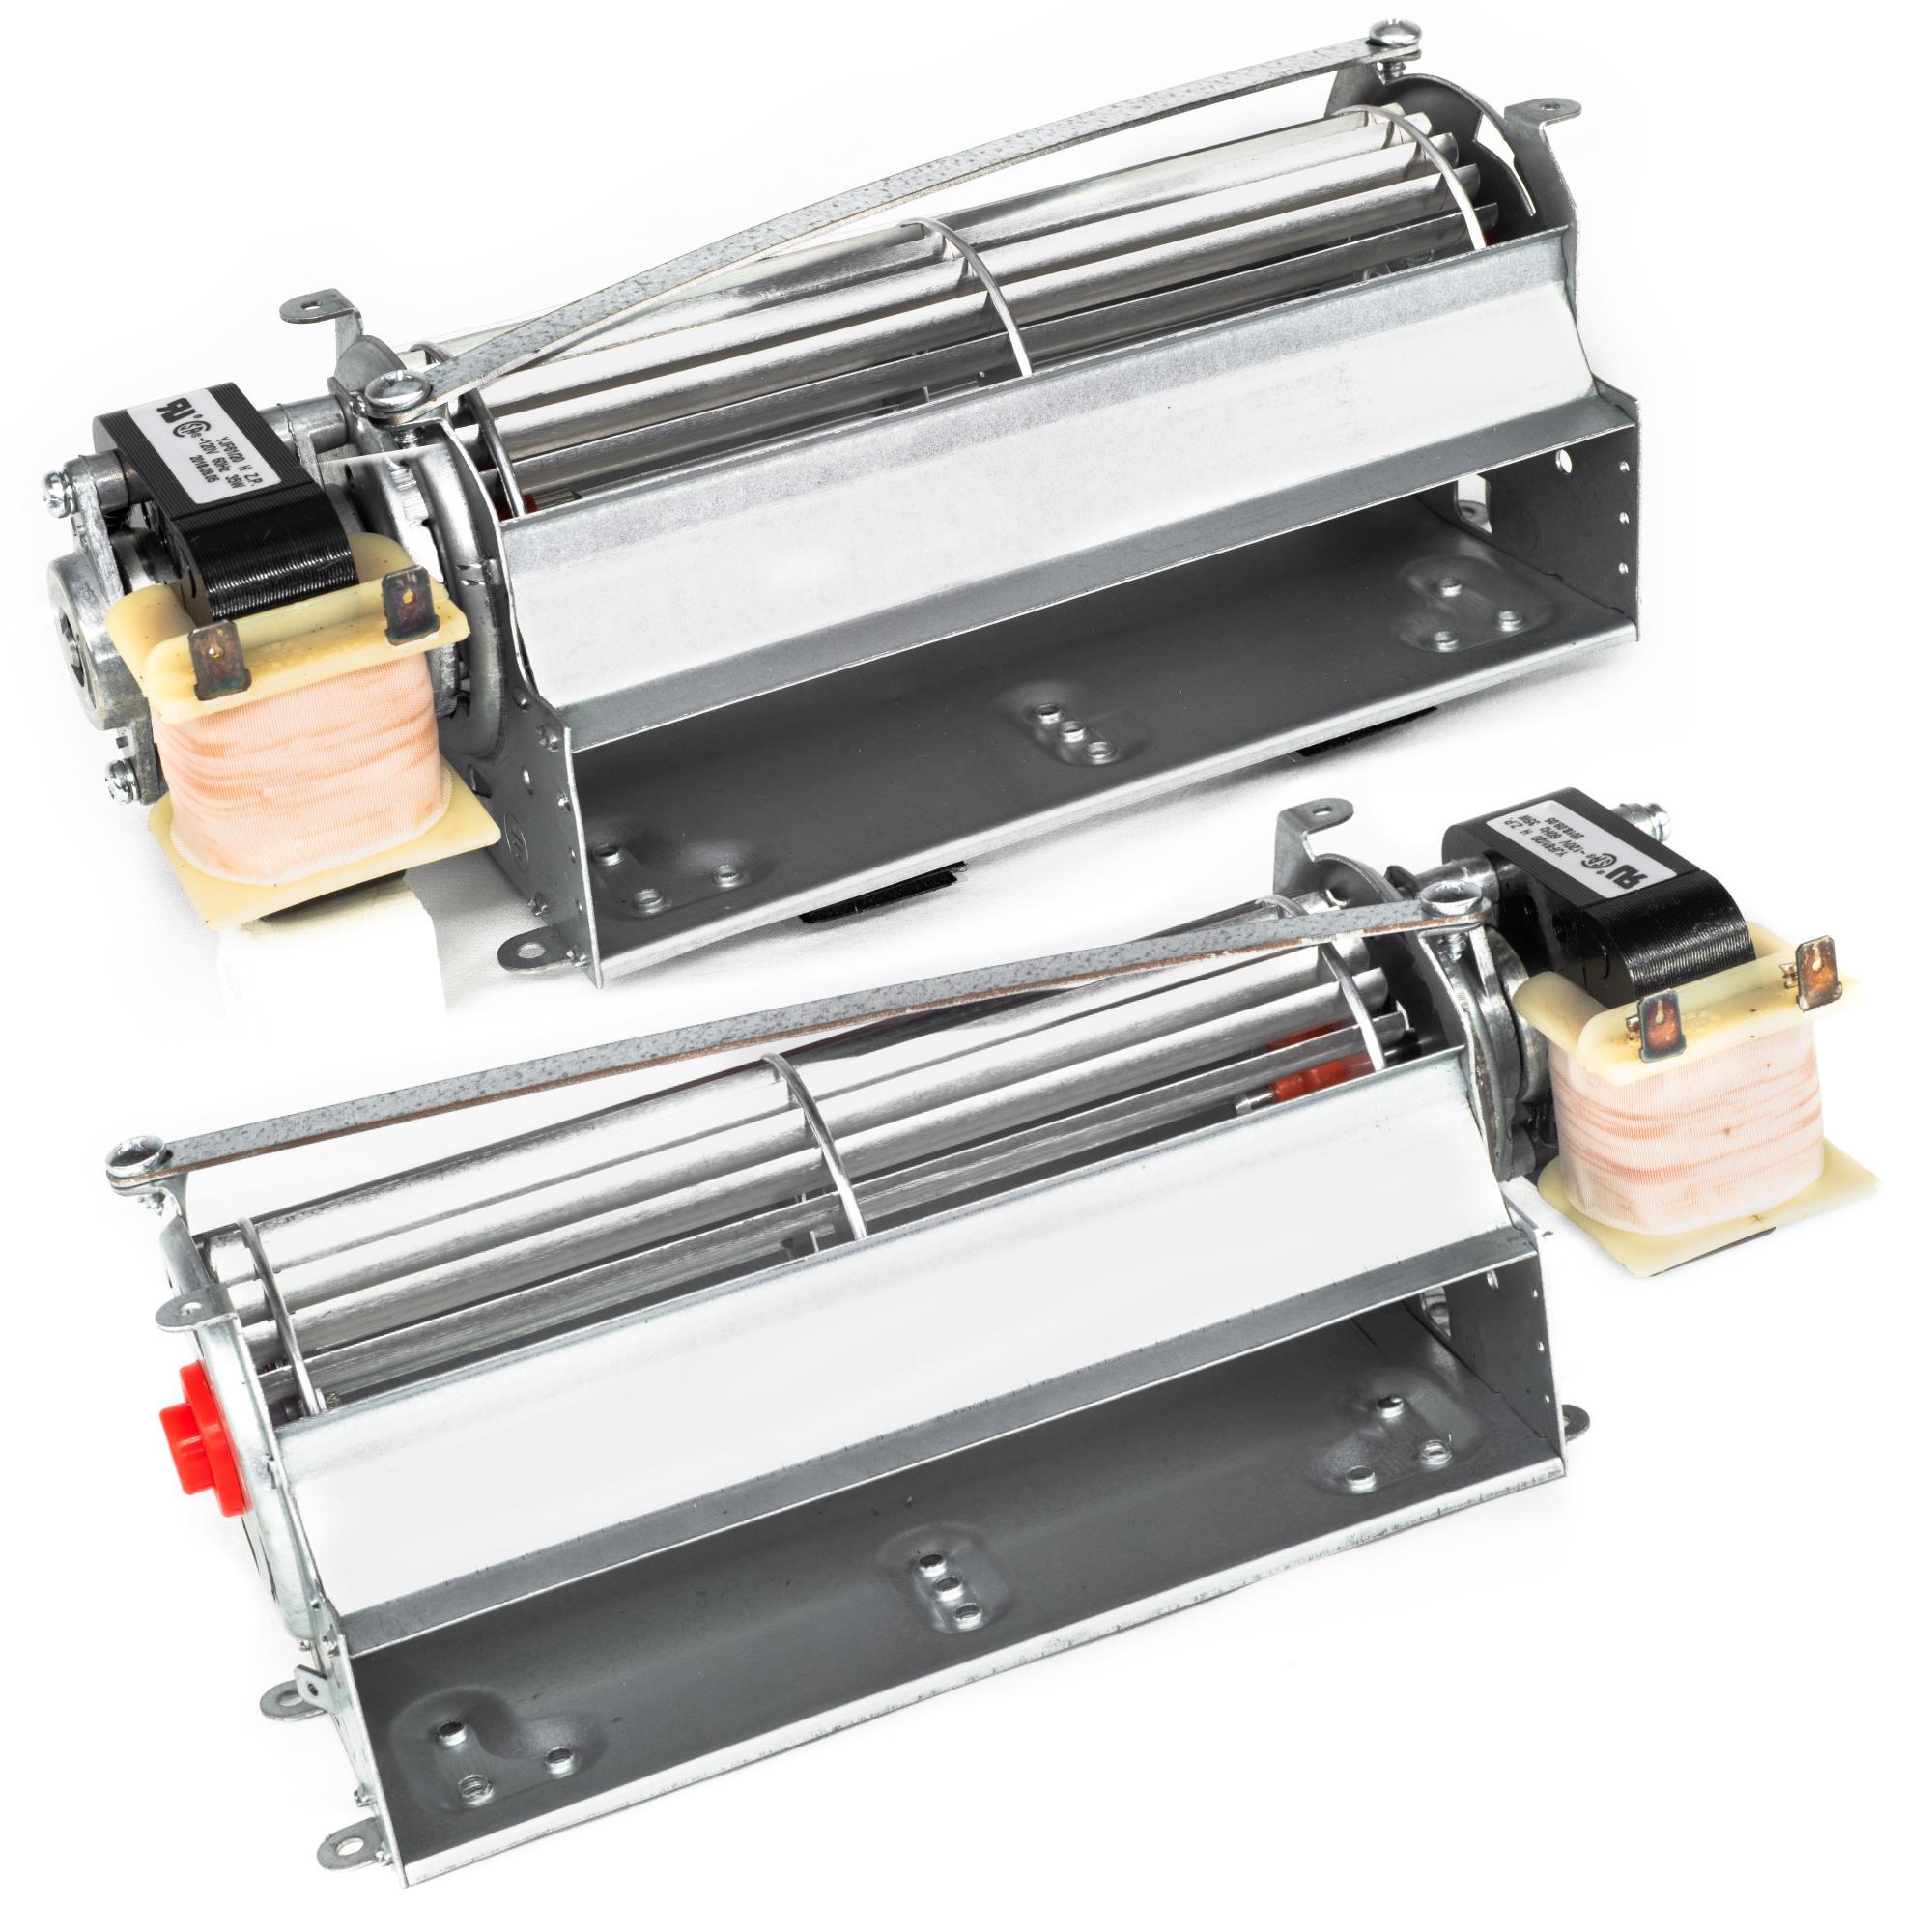 Kozy Heat 600-1 Replacement Blower Motor Bundle | Left + Right